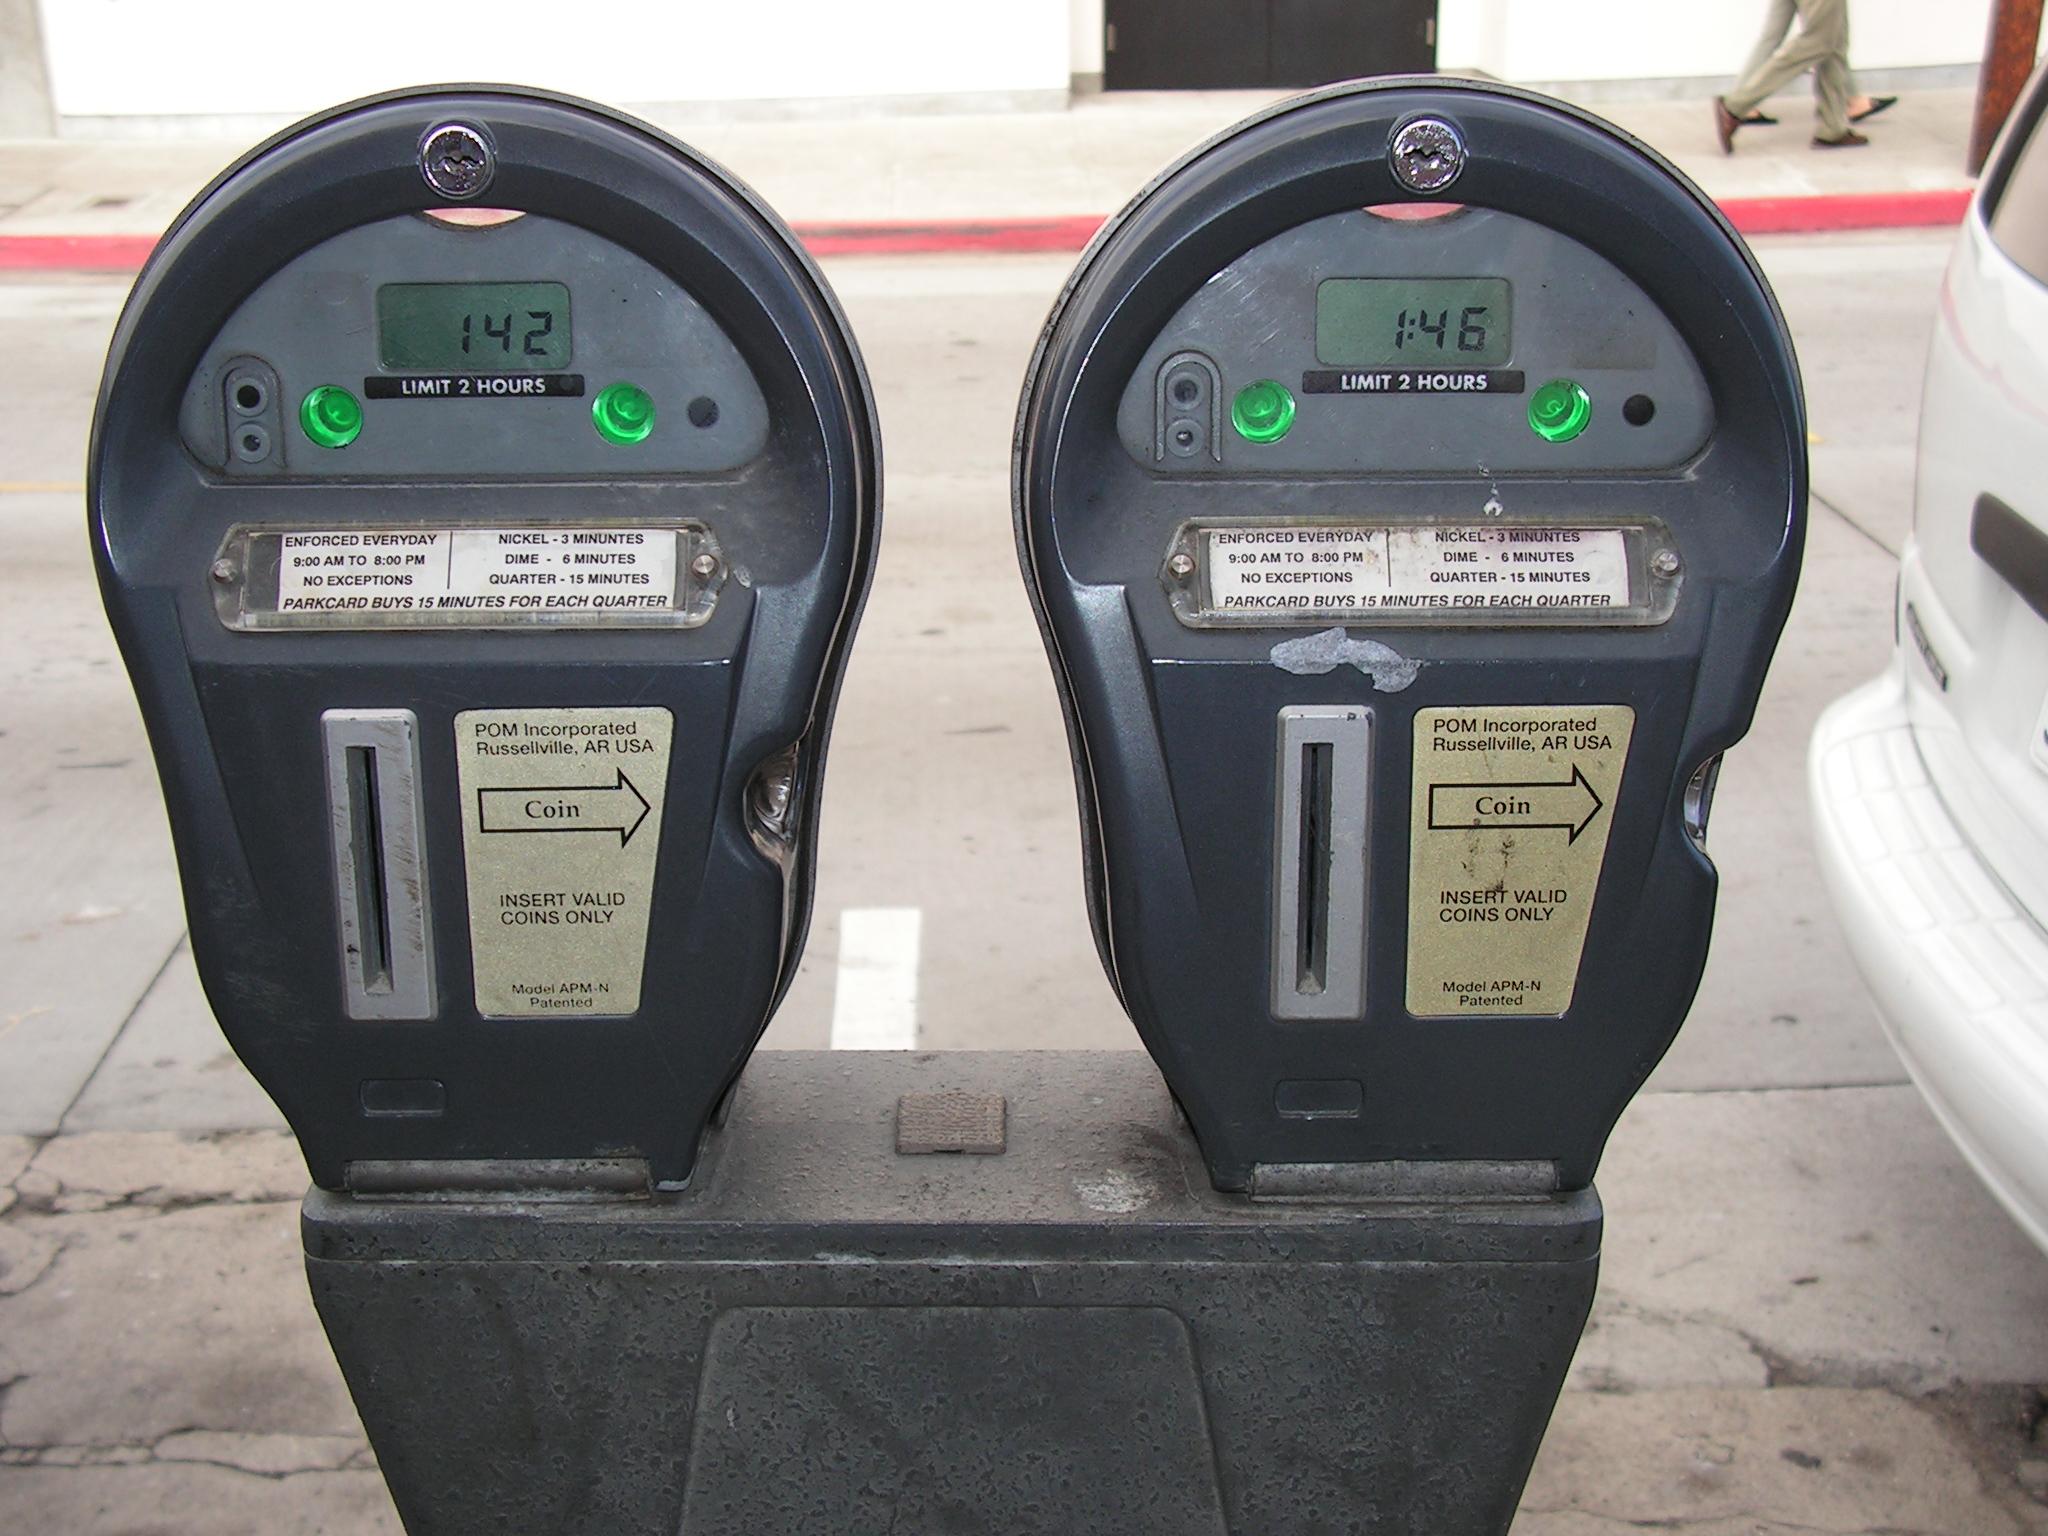 File:Parking meter.jpg - Wikimedia Commons